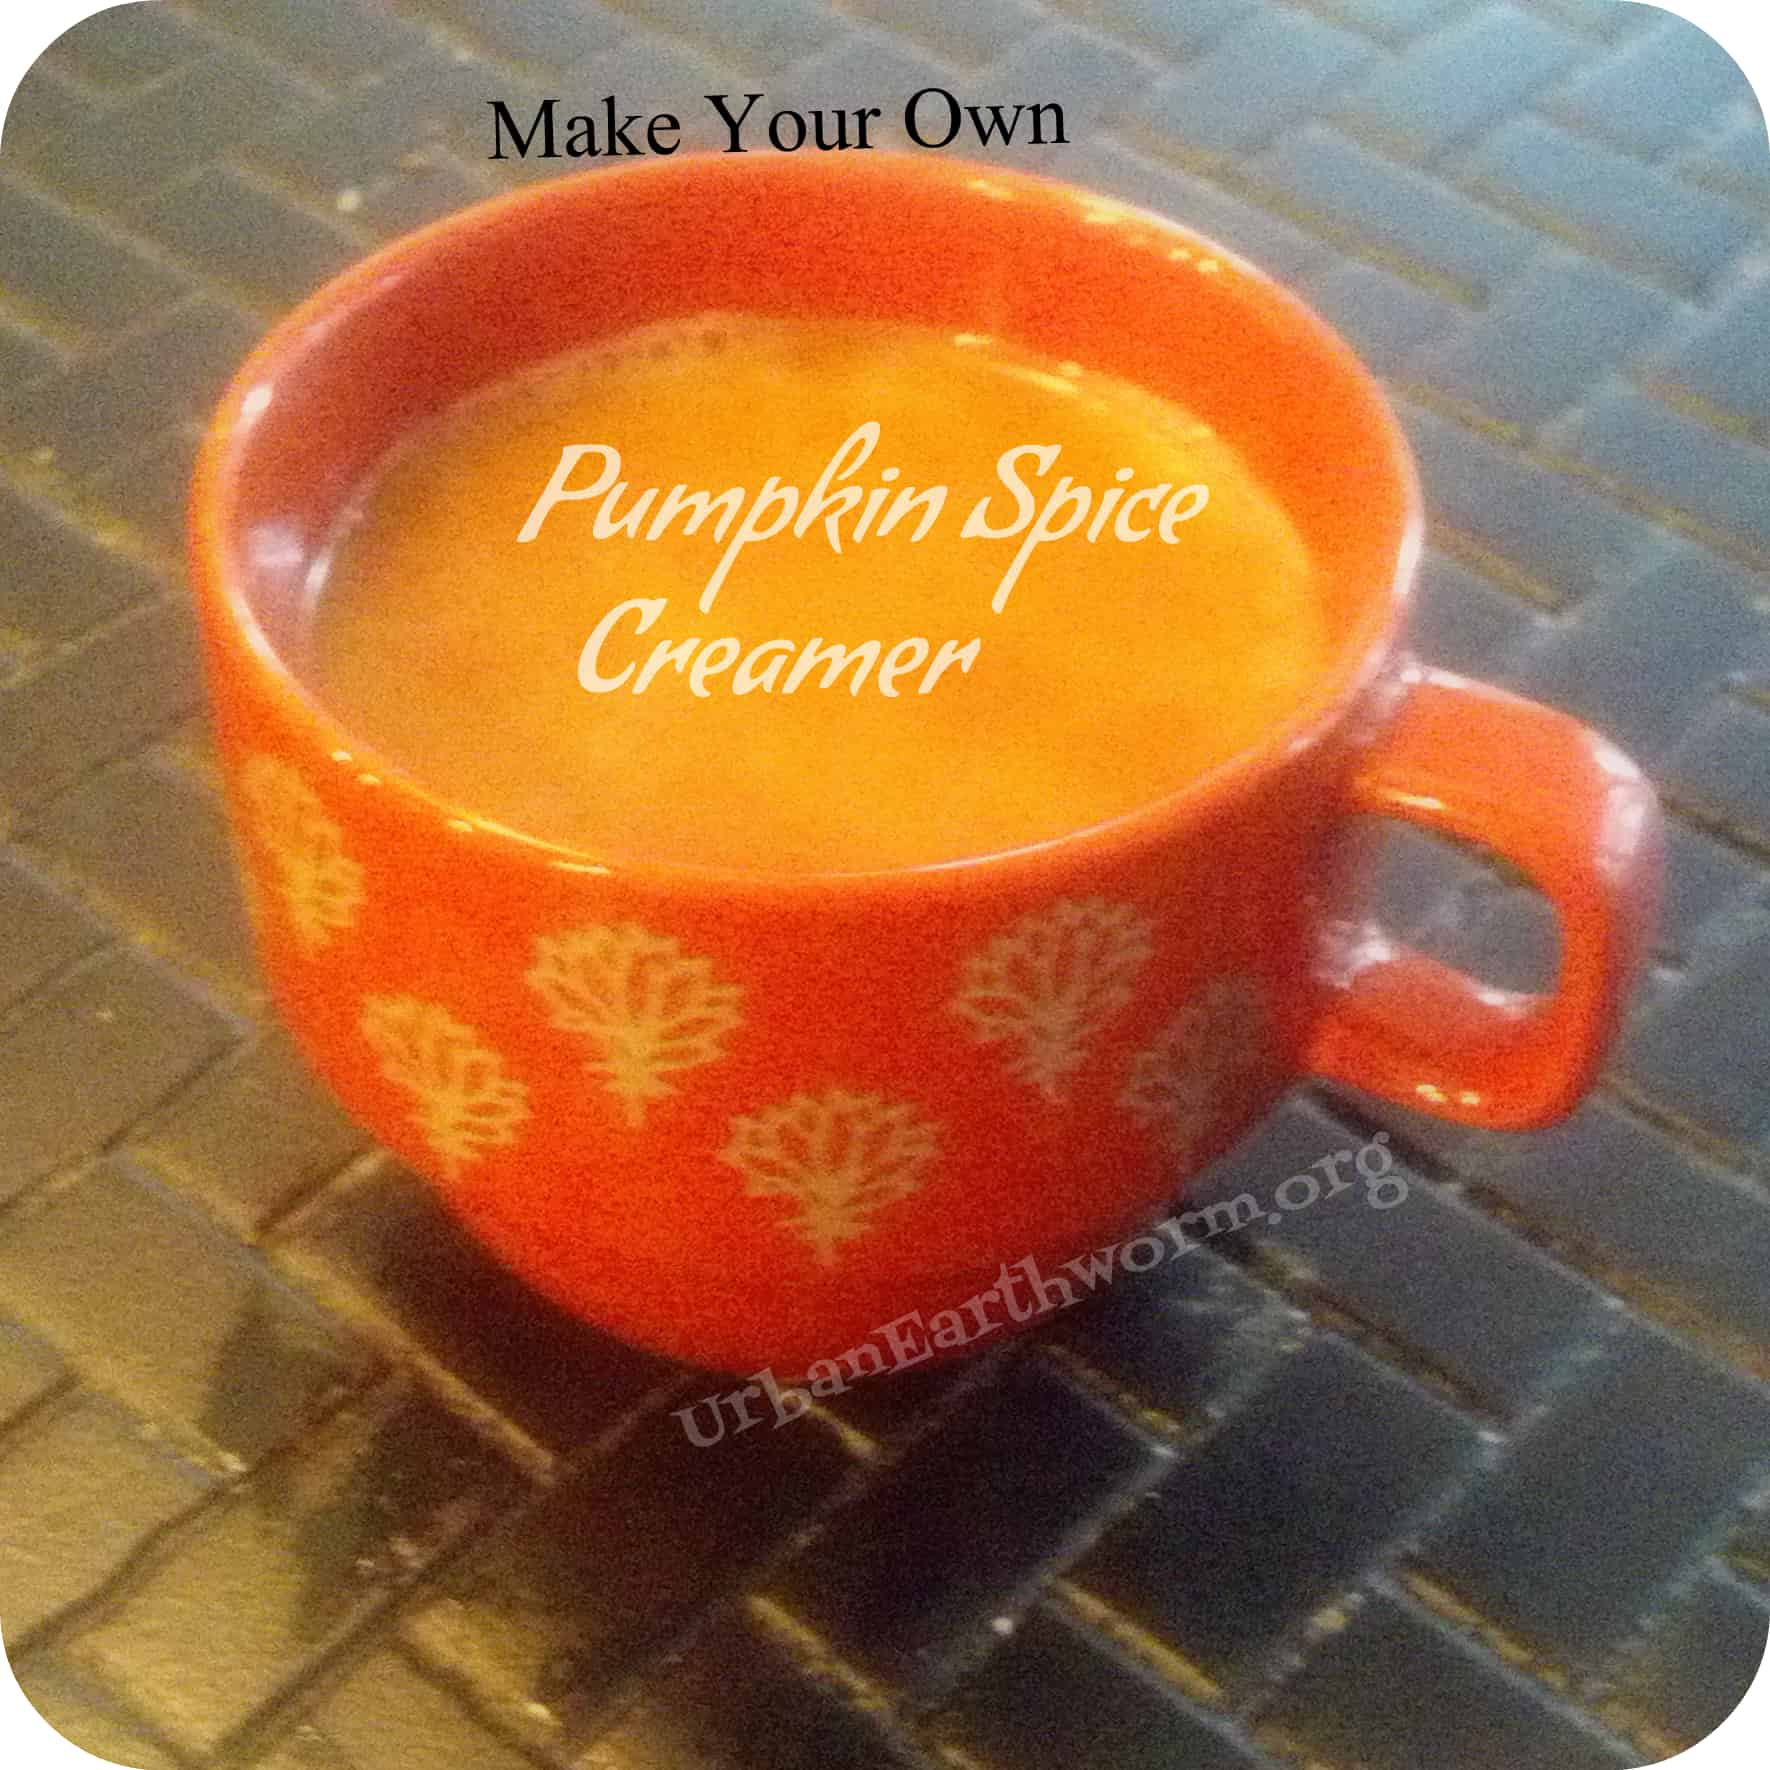 Diy pumpkin spice creamer for regular coffee